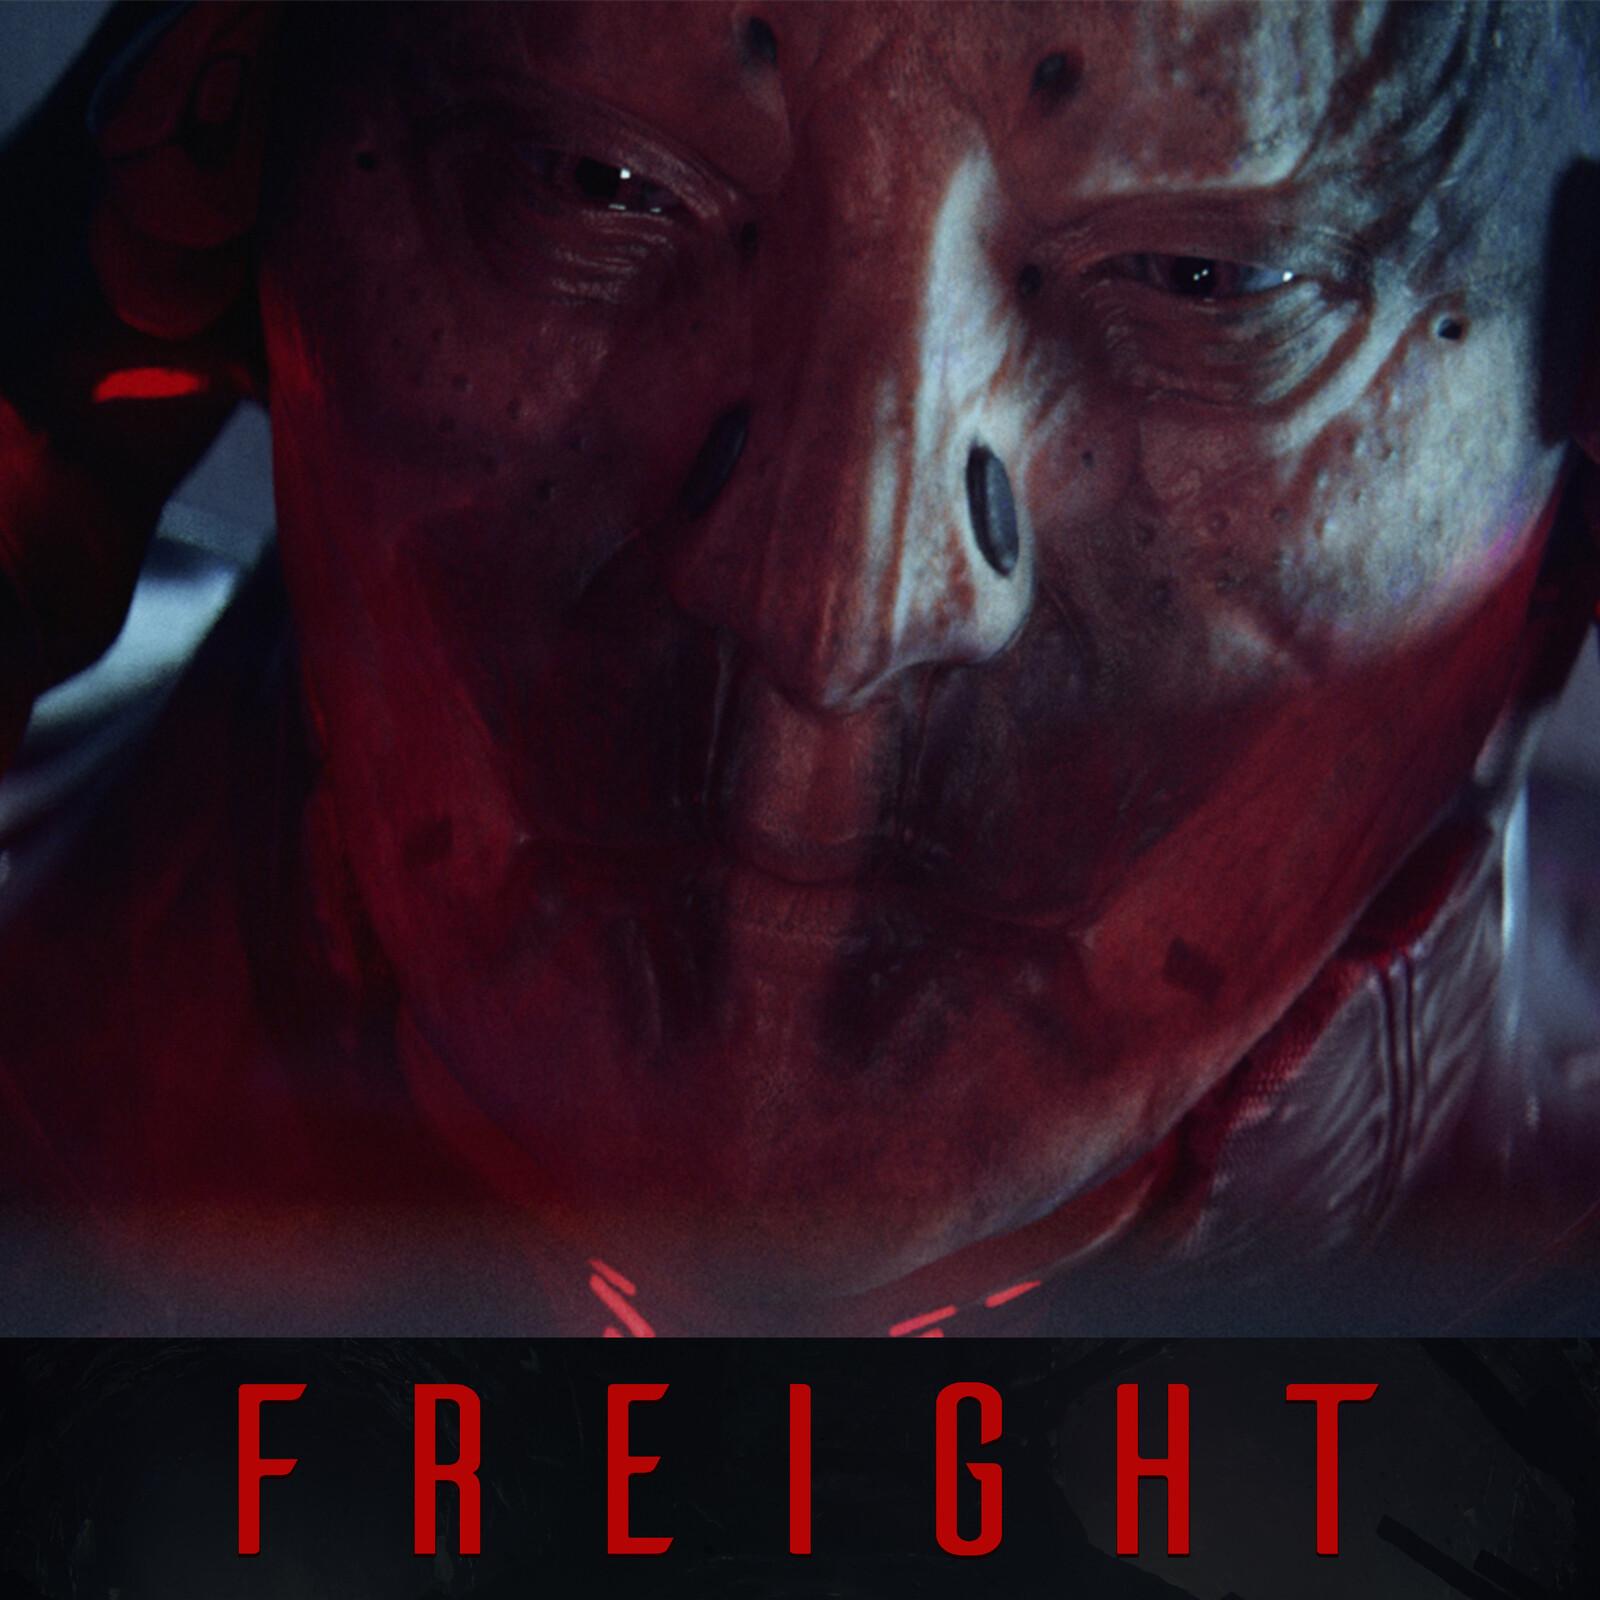 FREIGHT - Short Film